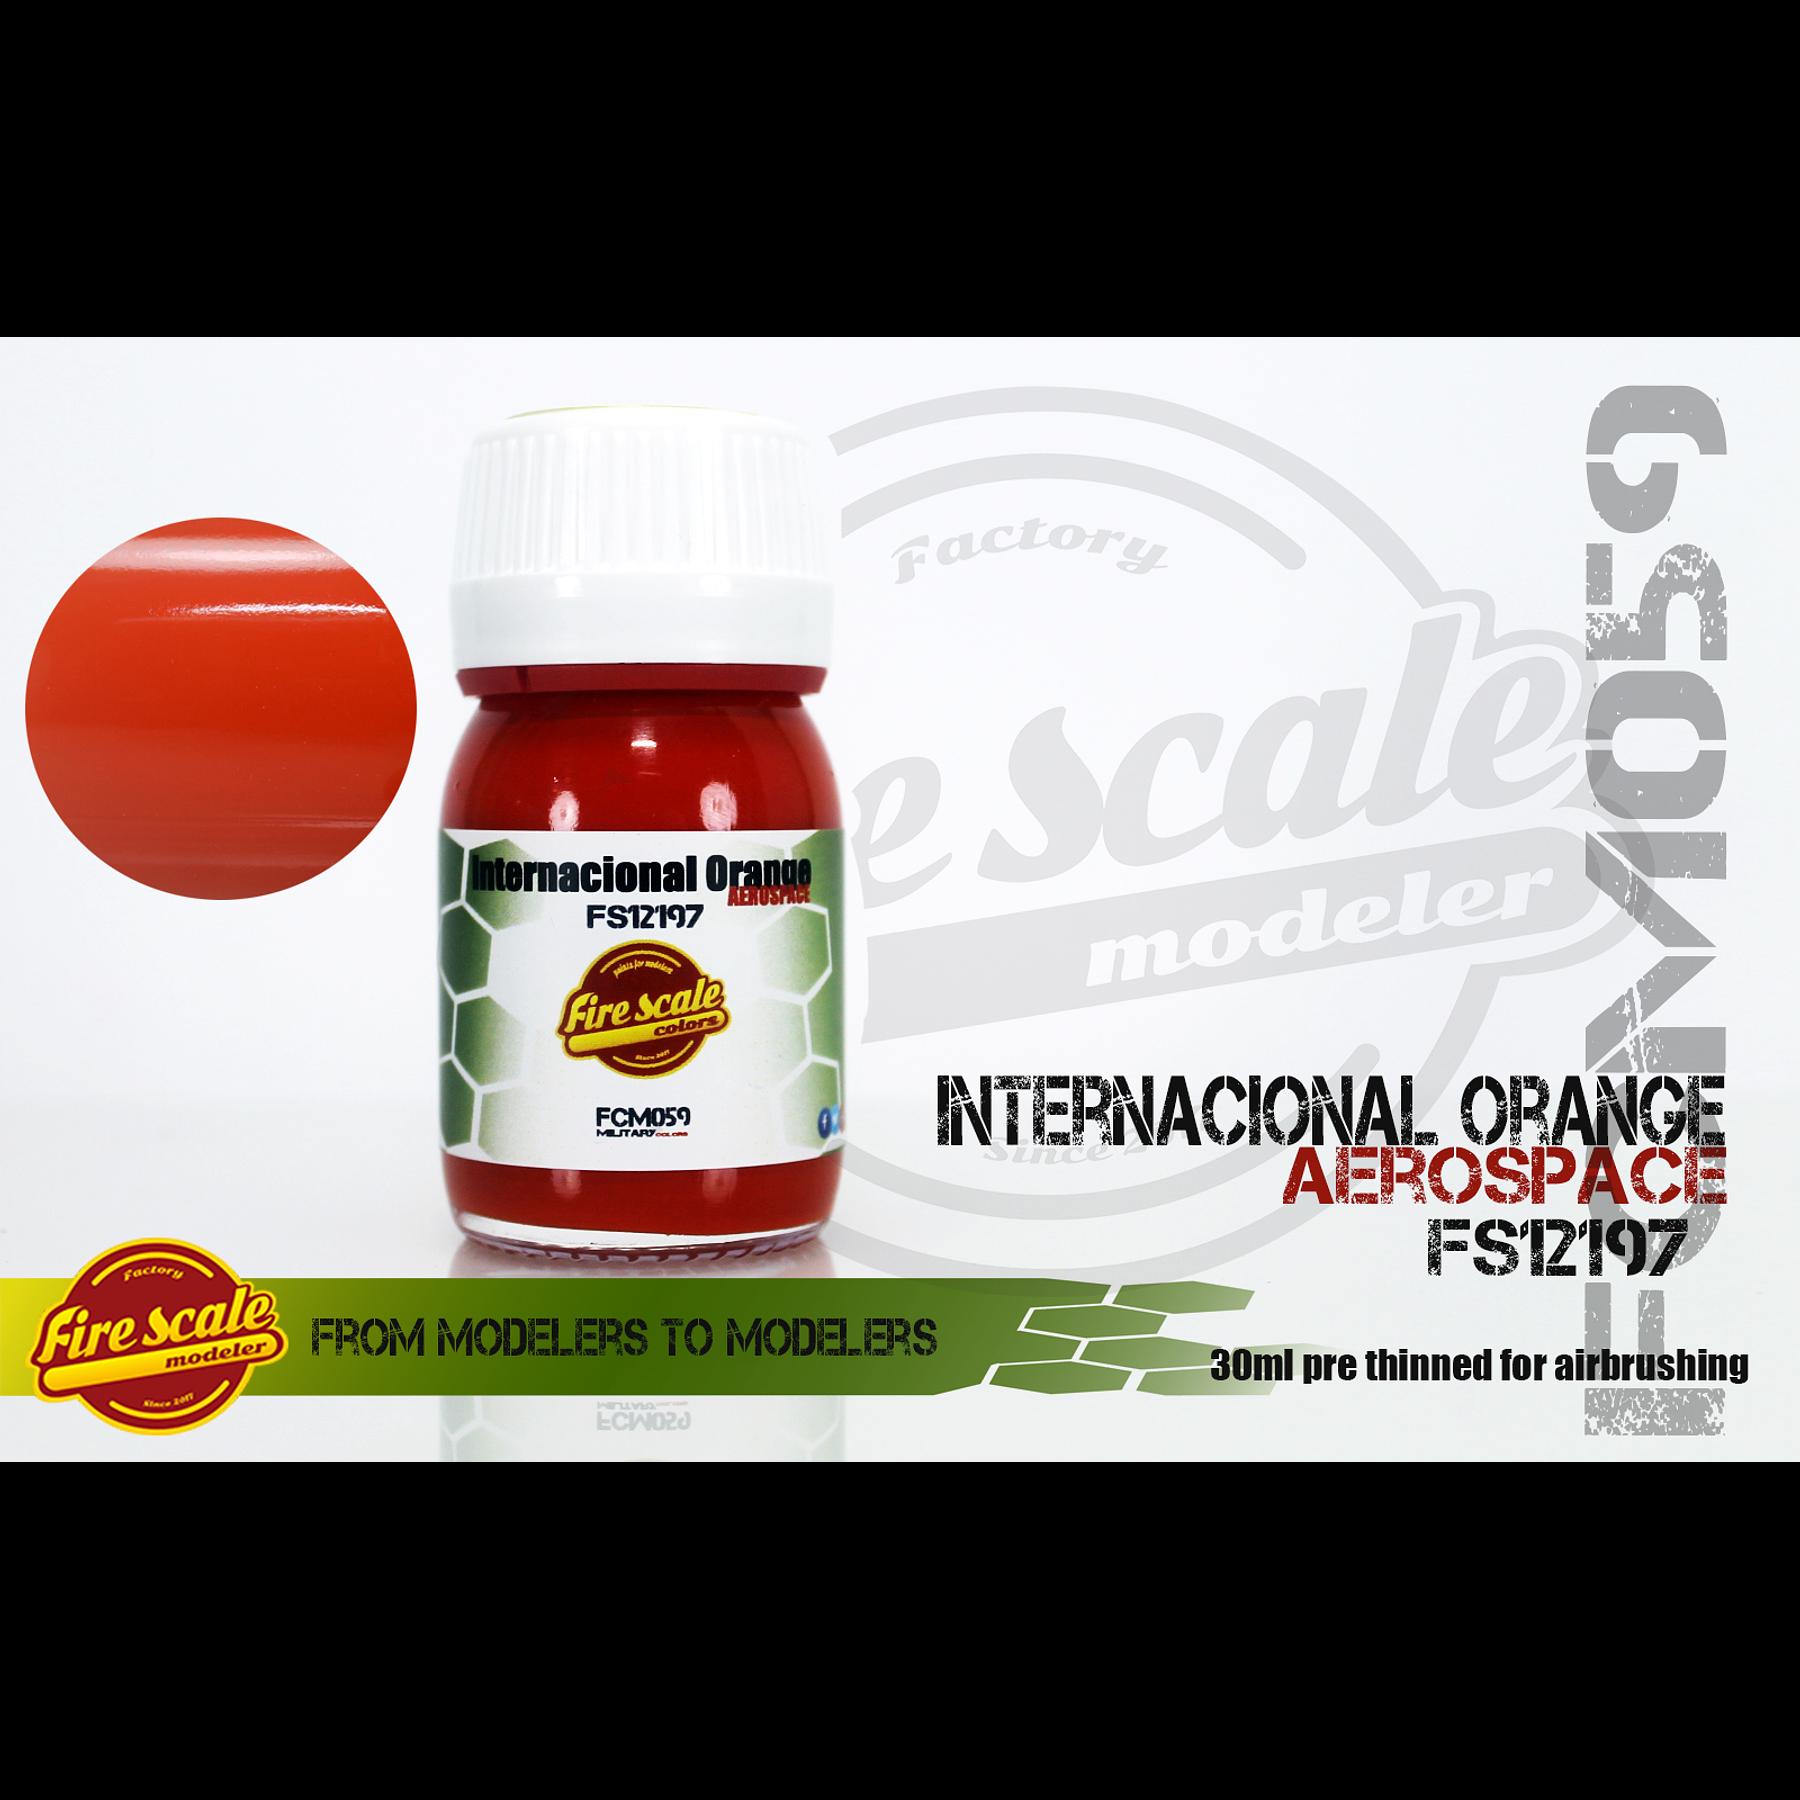 International Orange Aerospace